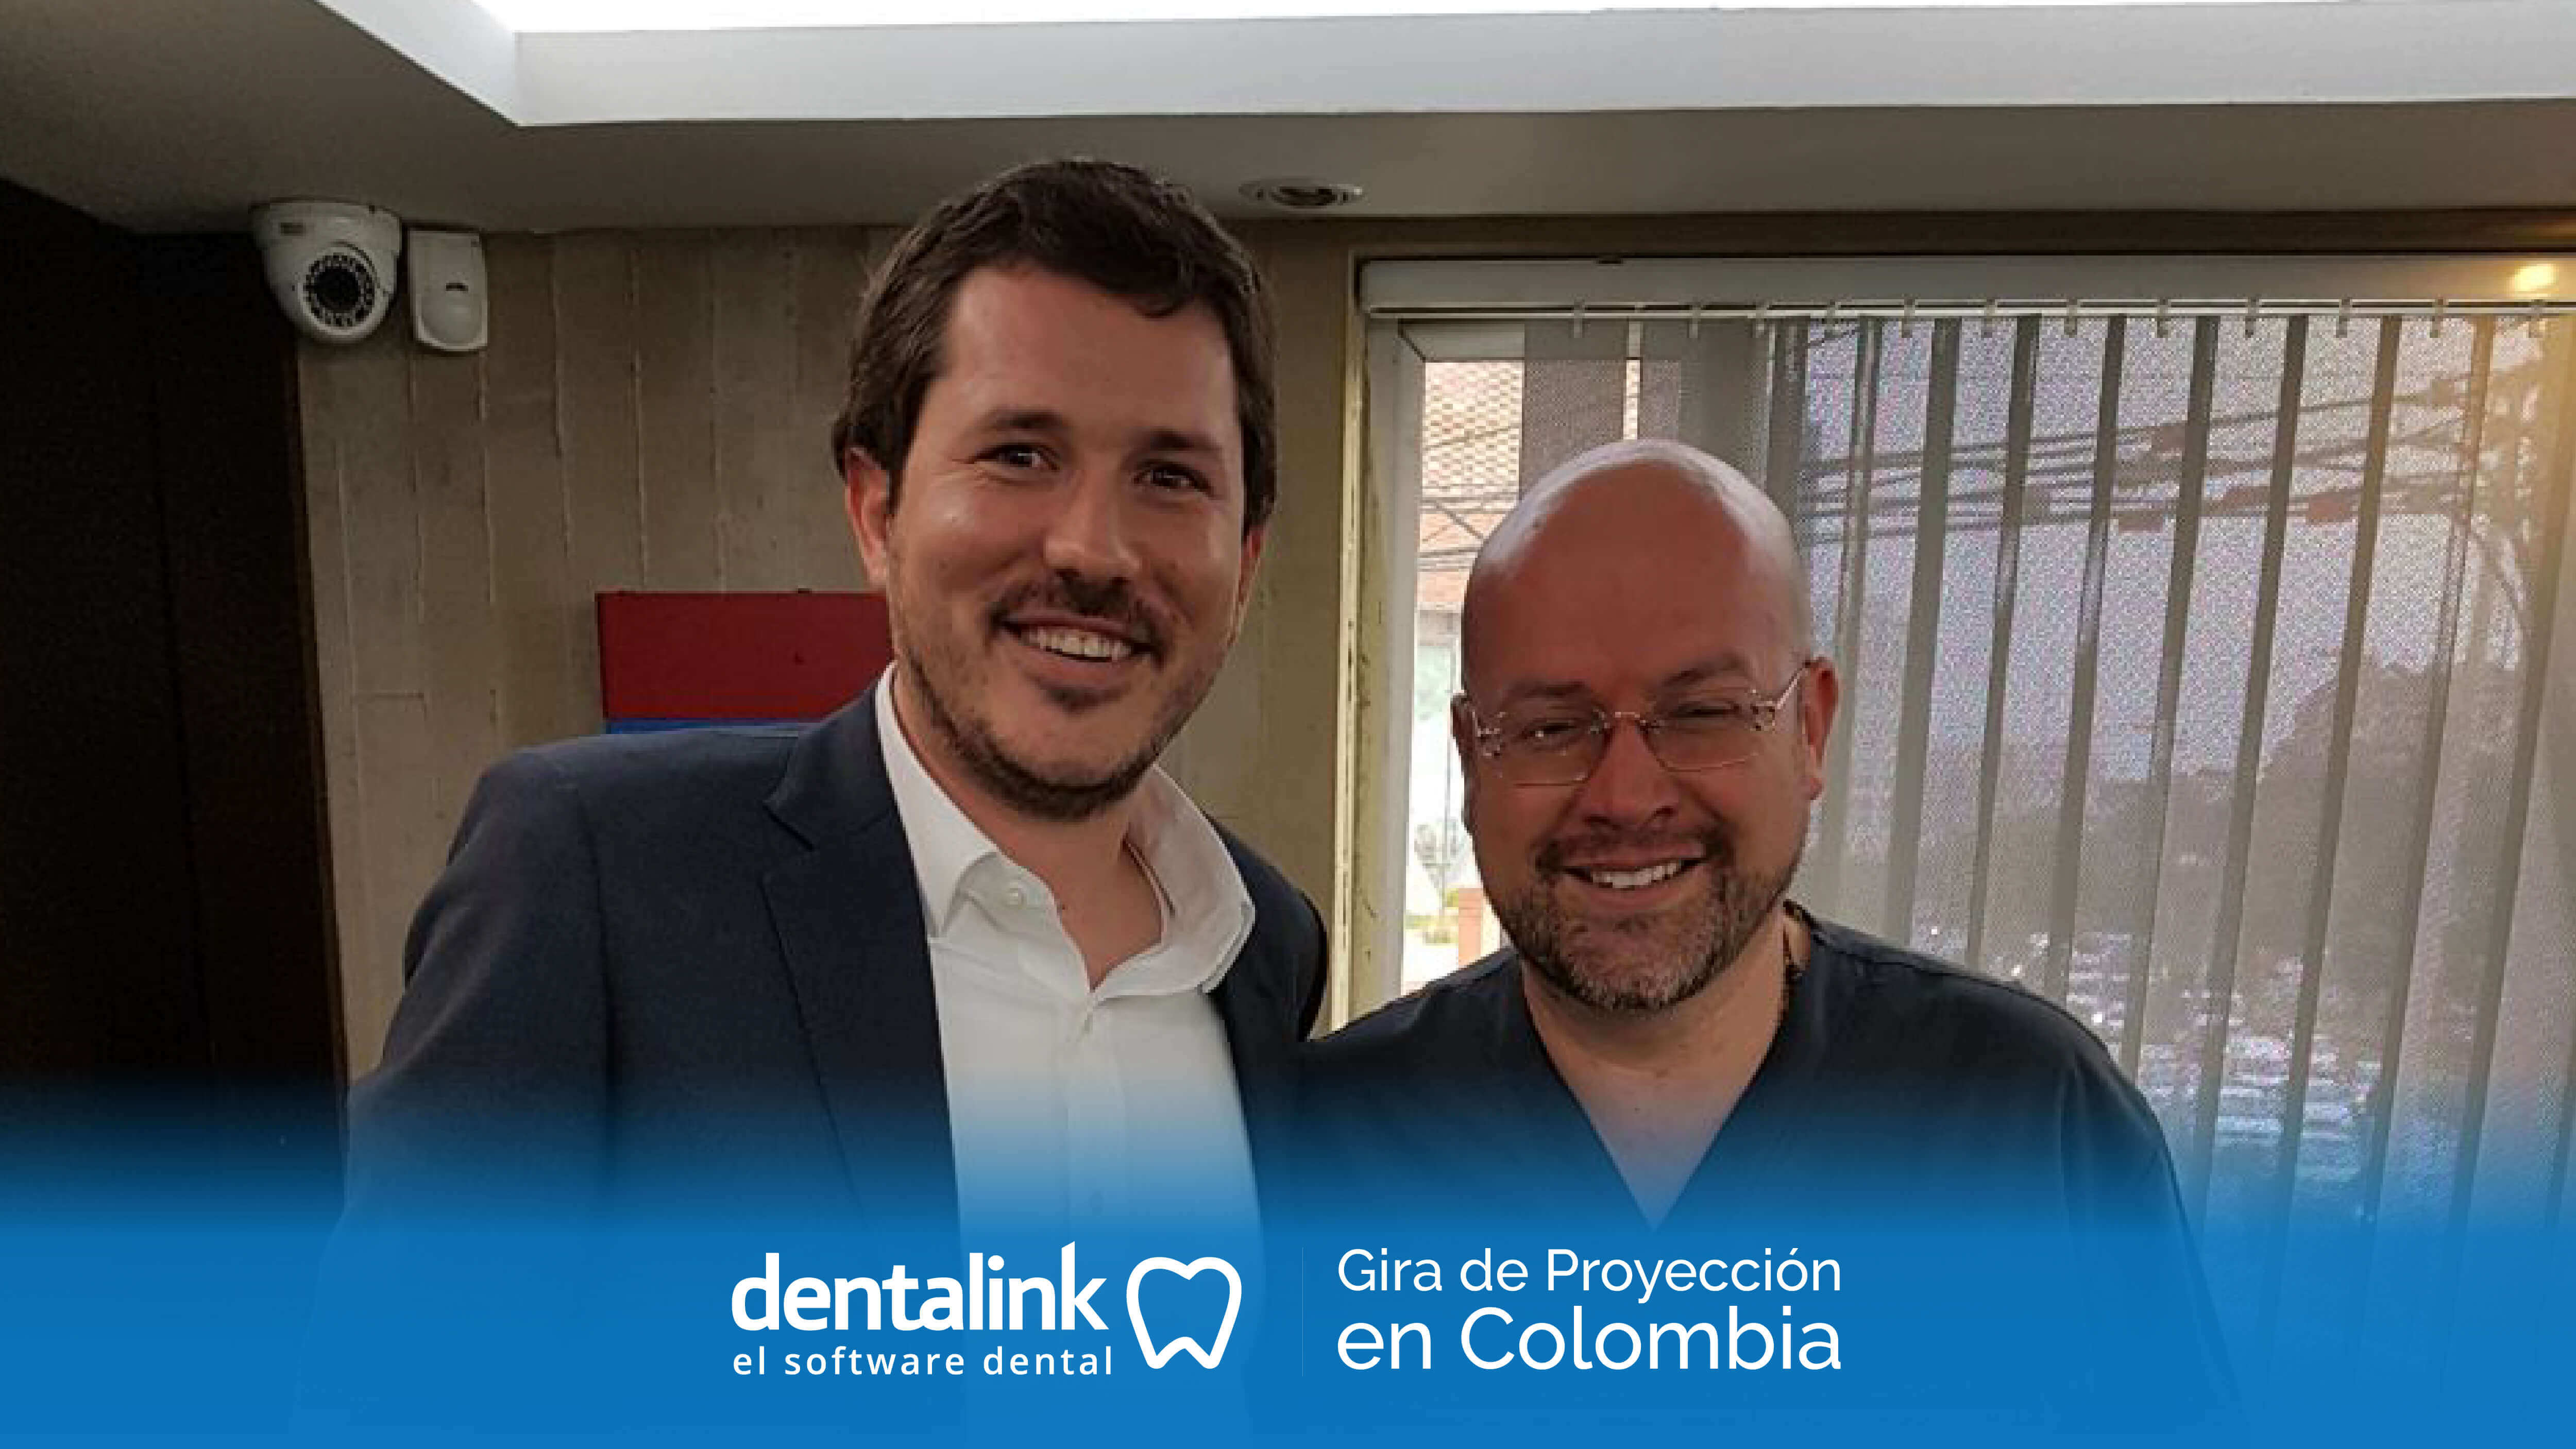 dentalink colombia